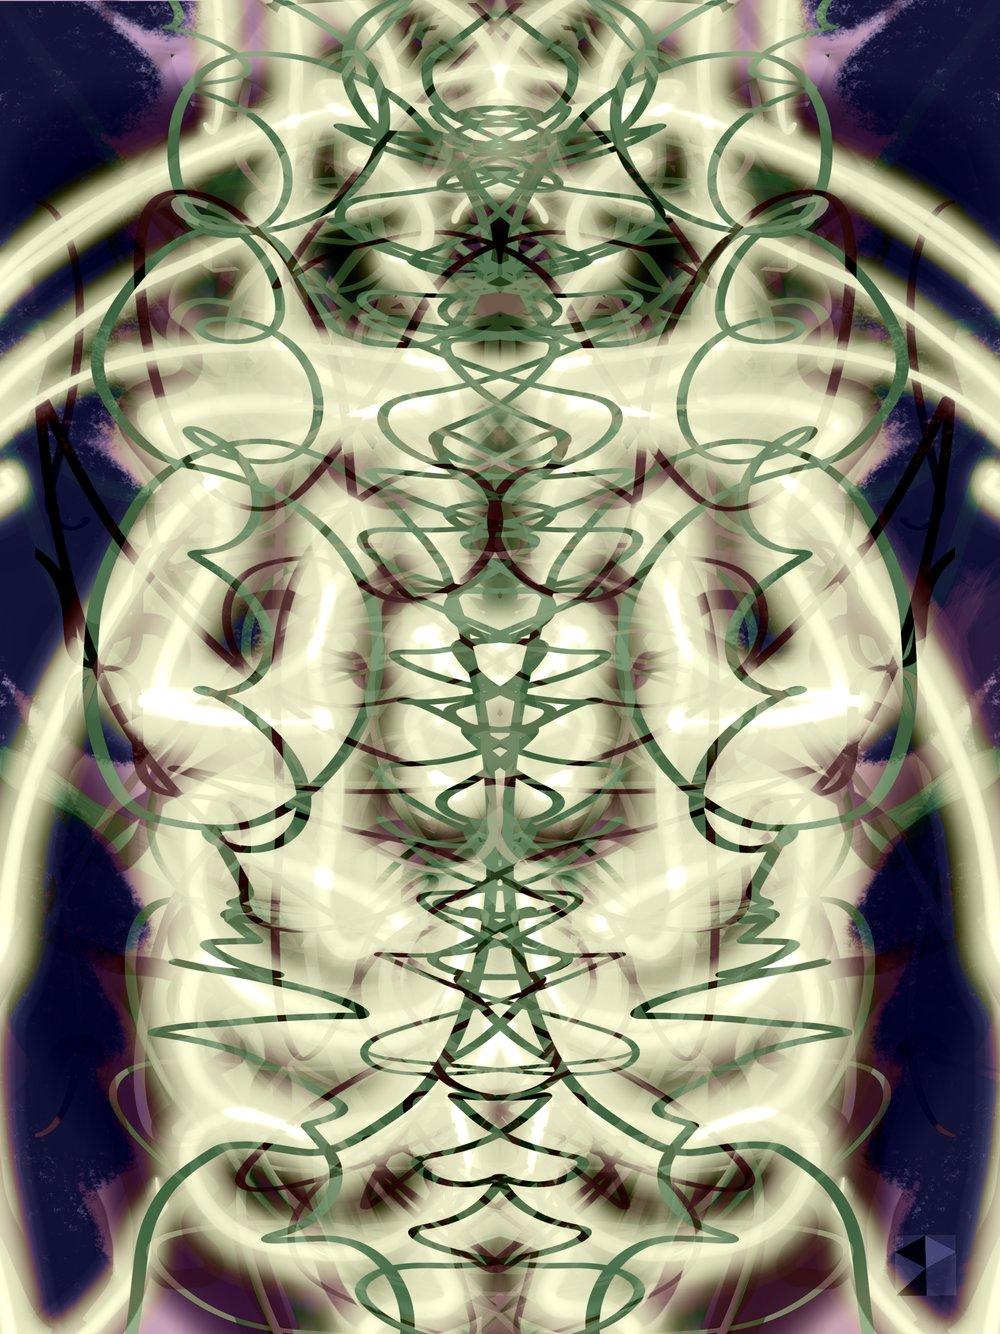 Bones   Electronics Paintings  Maya 2019 SP  dimensions variable